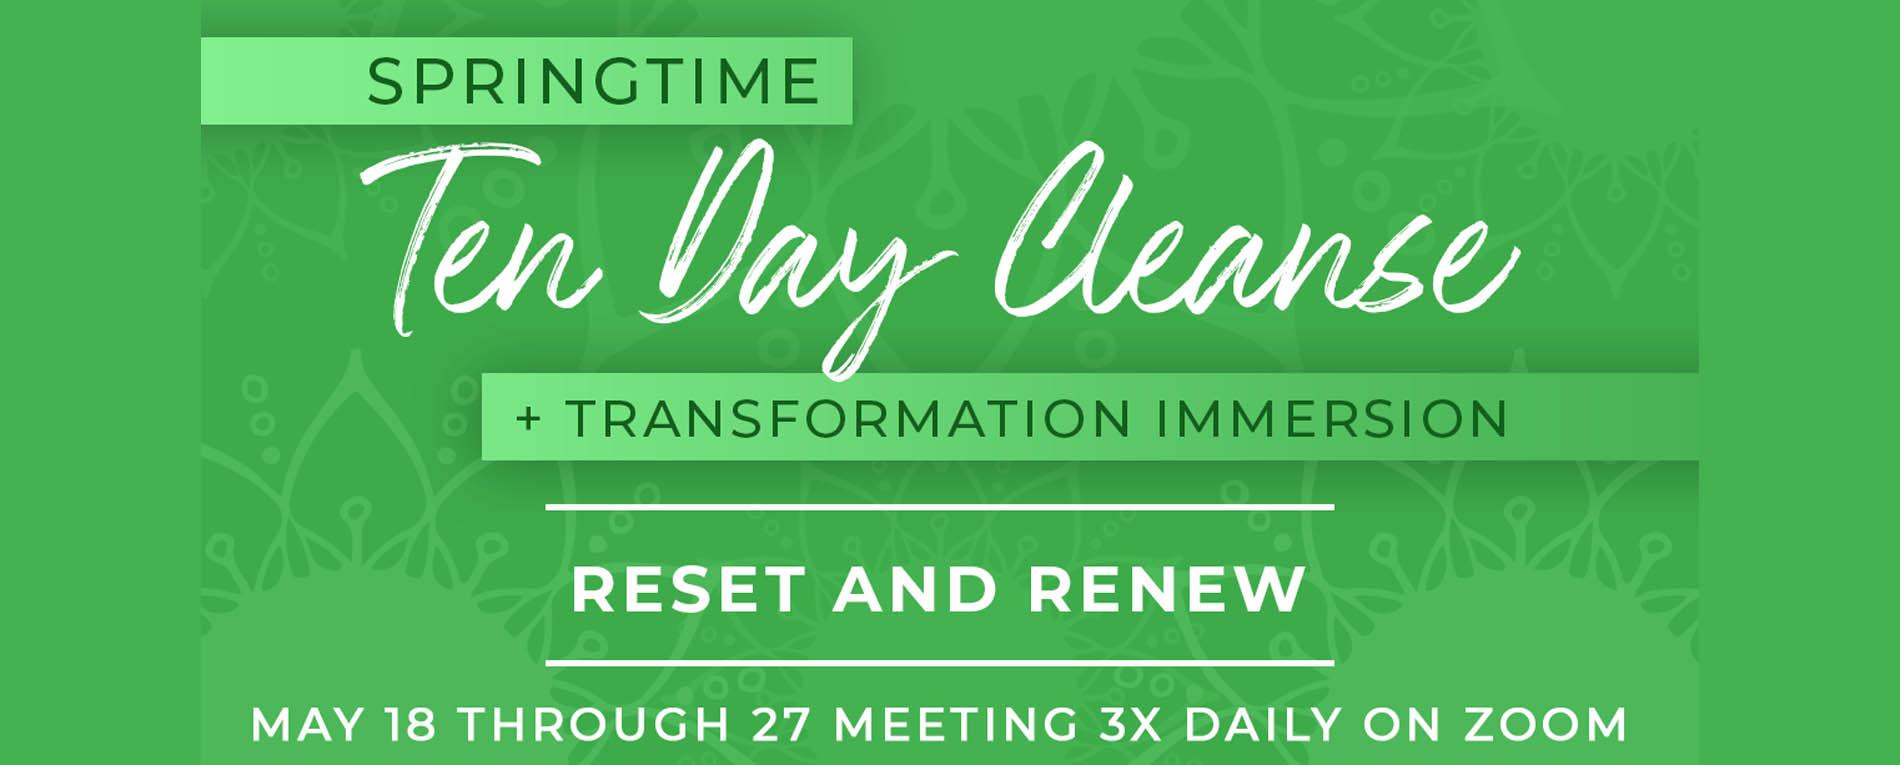 Ten Day Immersion